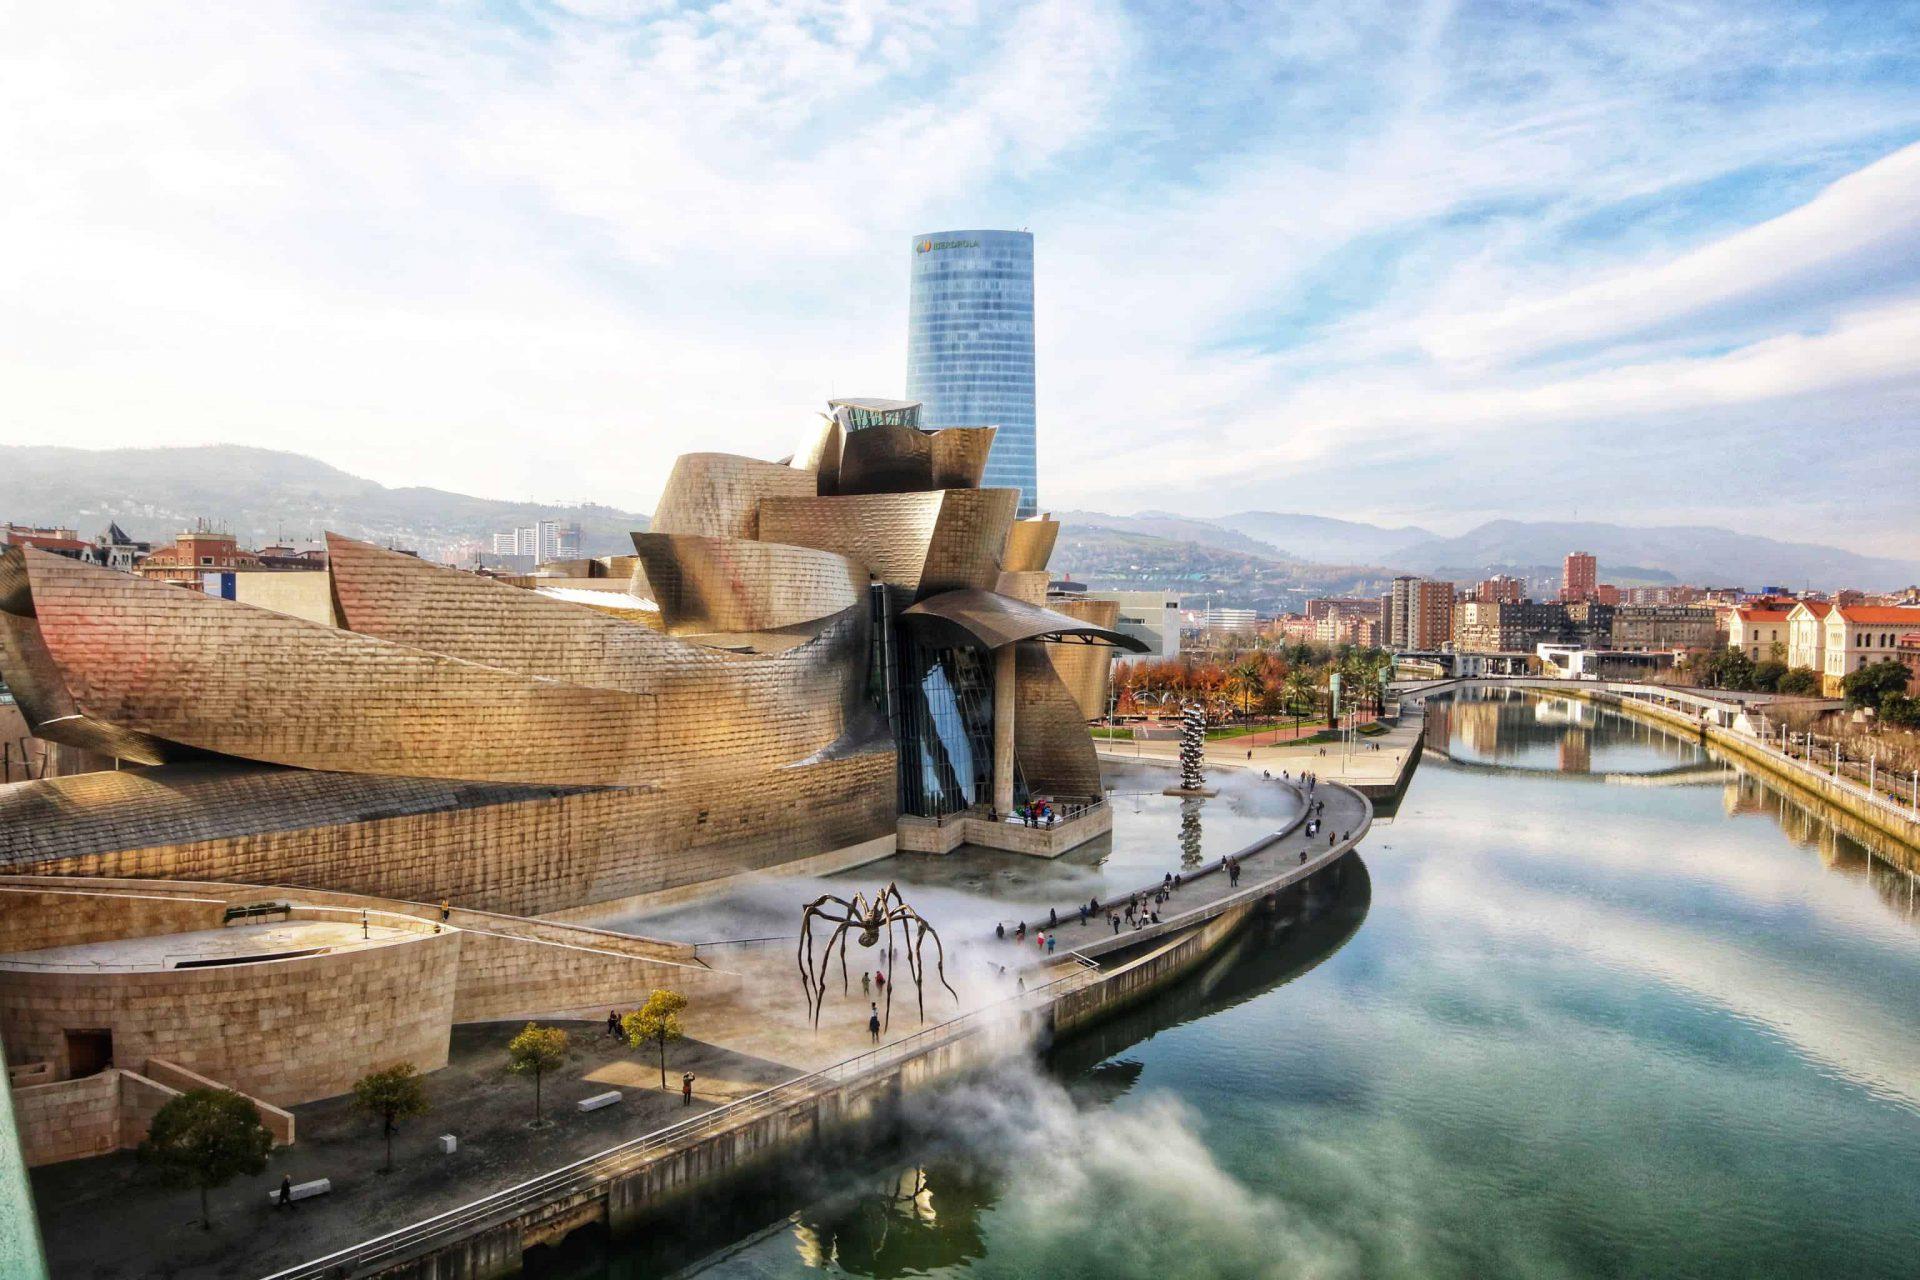 jorge fernandez salas 1204346 unsplash - Stedentrip Bilbao: de mooiste bezienswaardigheden & leukste restaurants